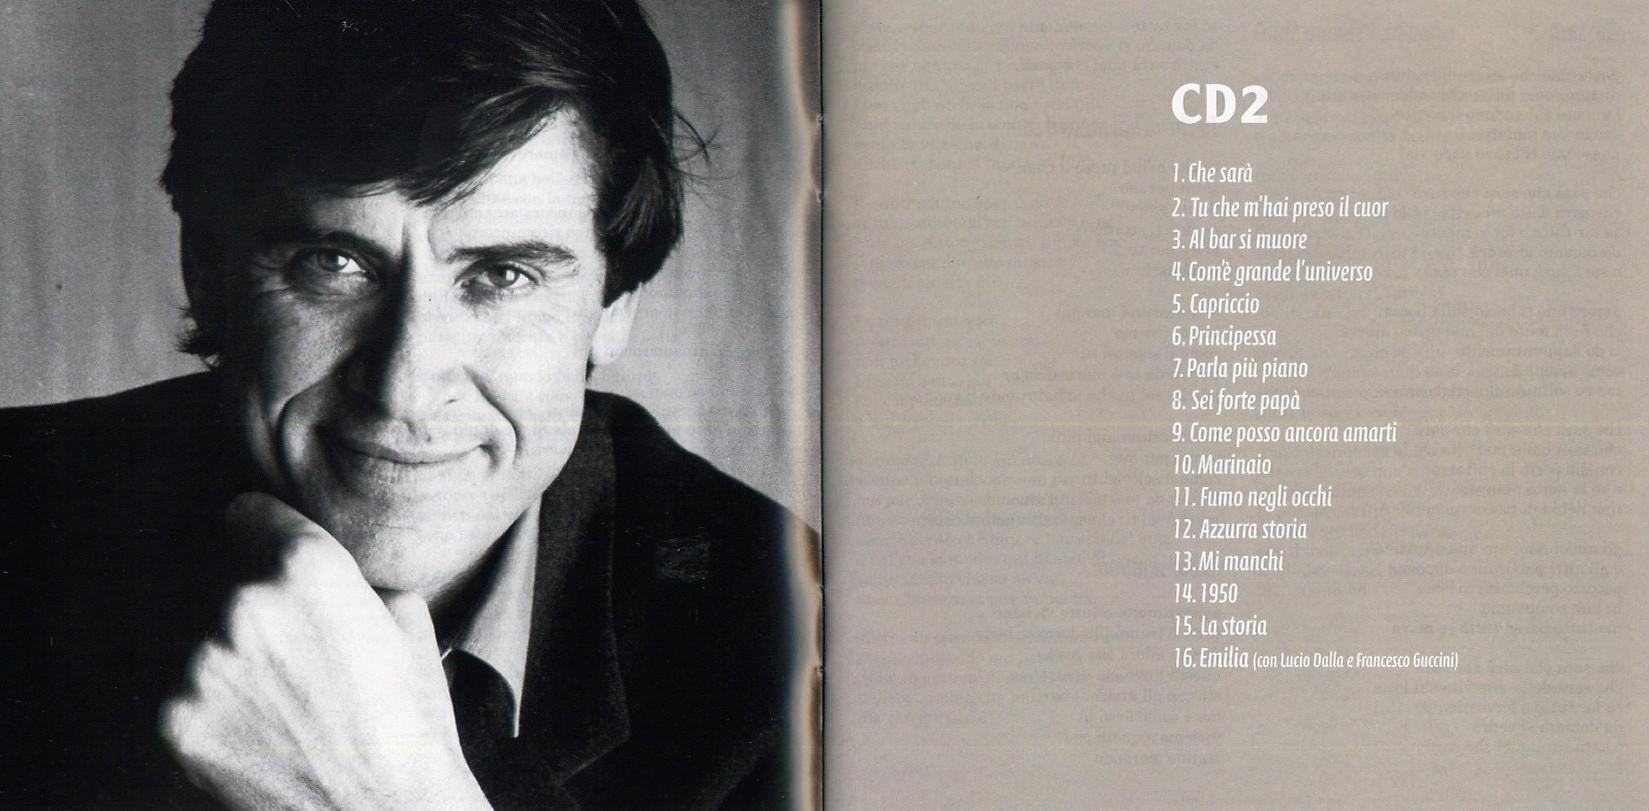 Marinaio gianni morandi biography - oximoron.info   QQ音乐 ... - photo#14